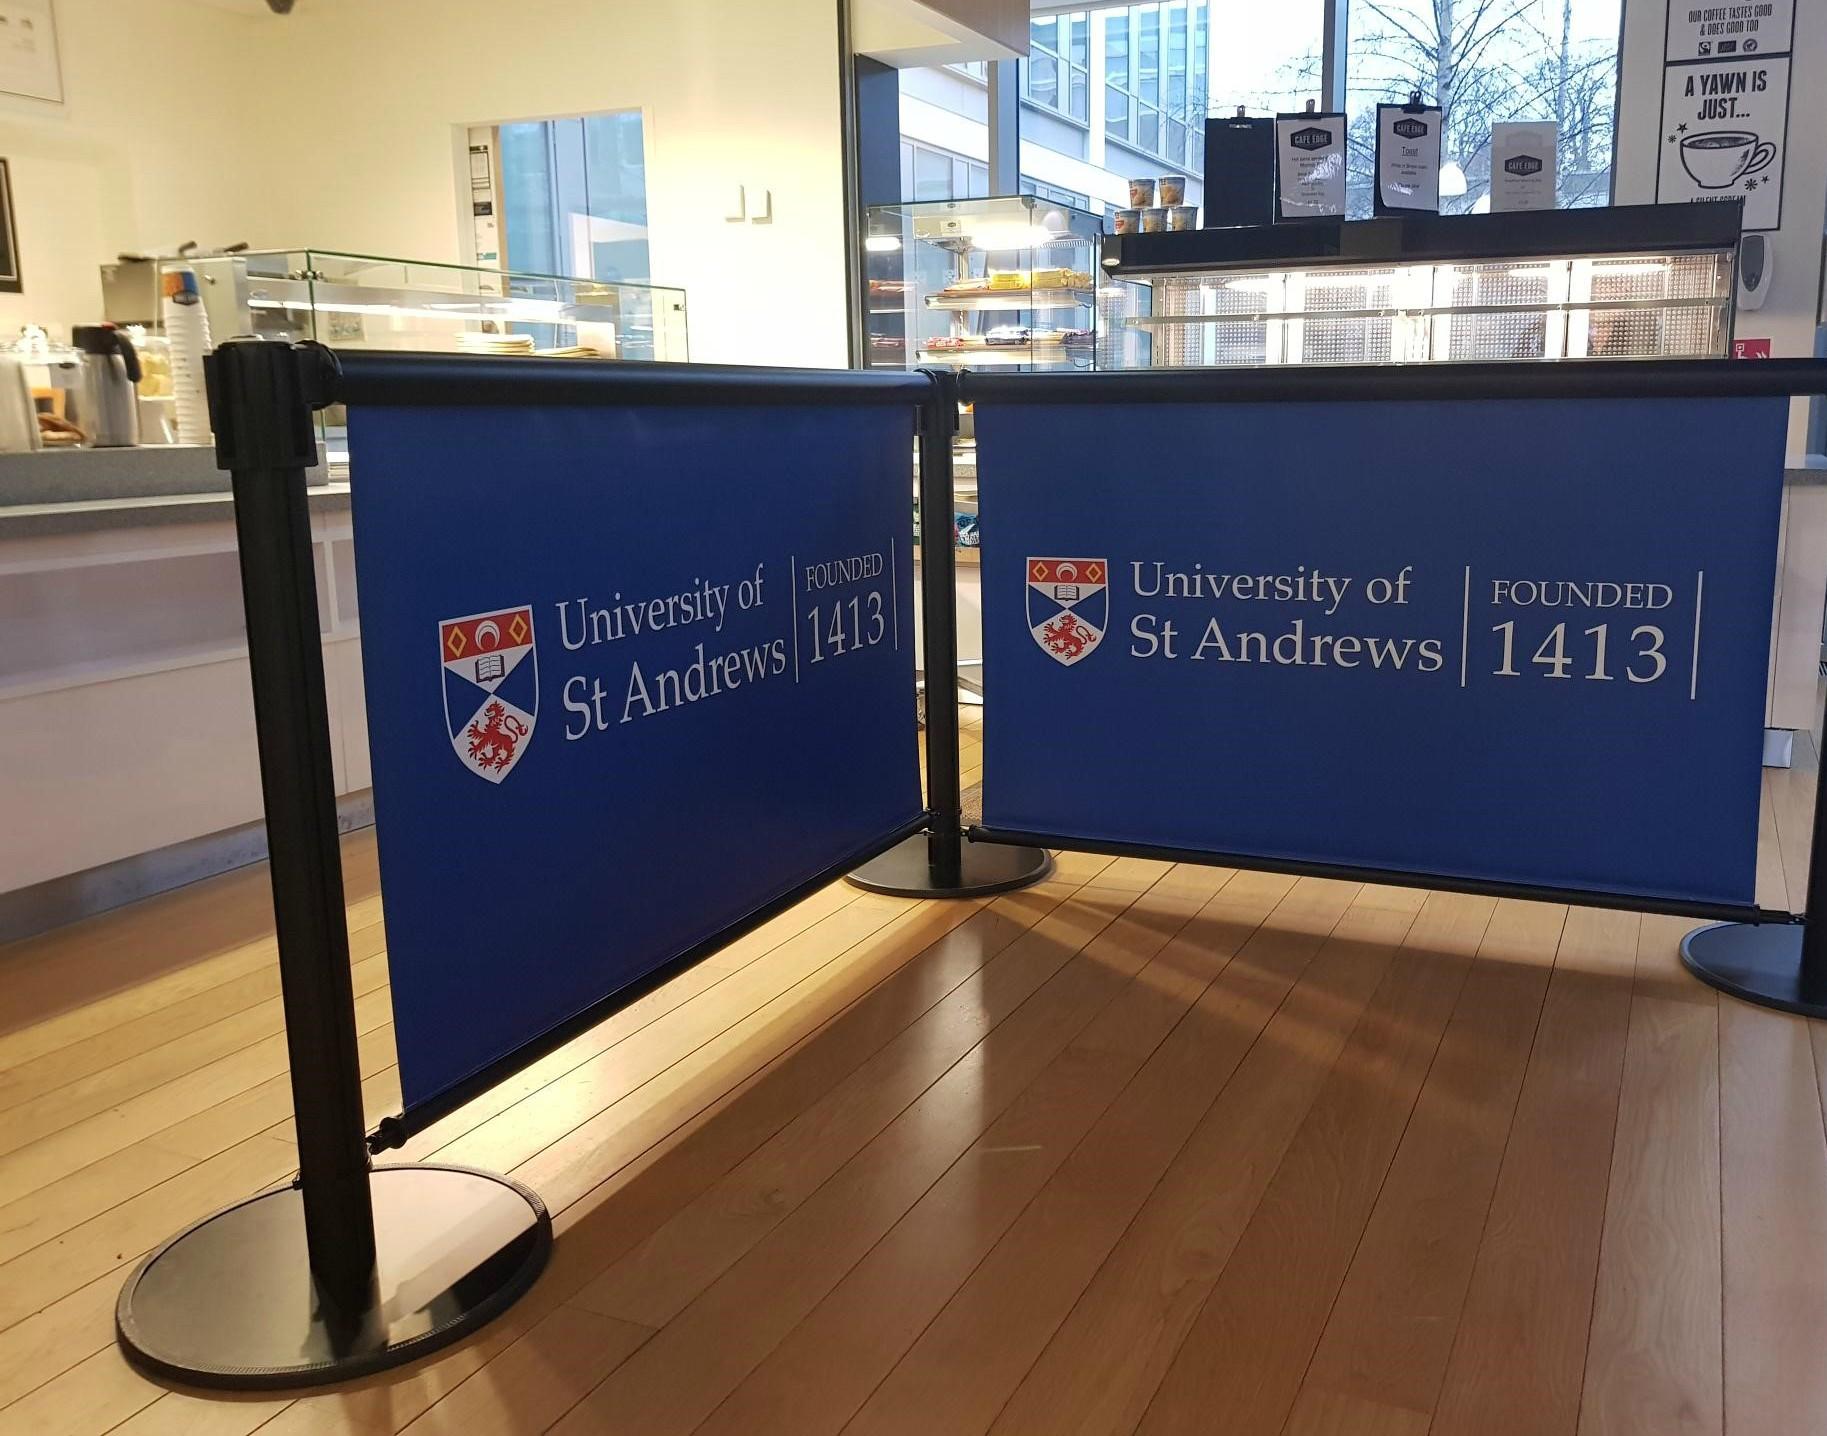 4 University of St Andrews